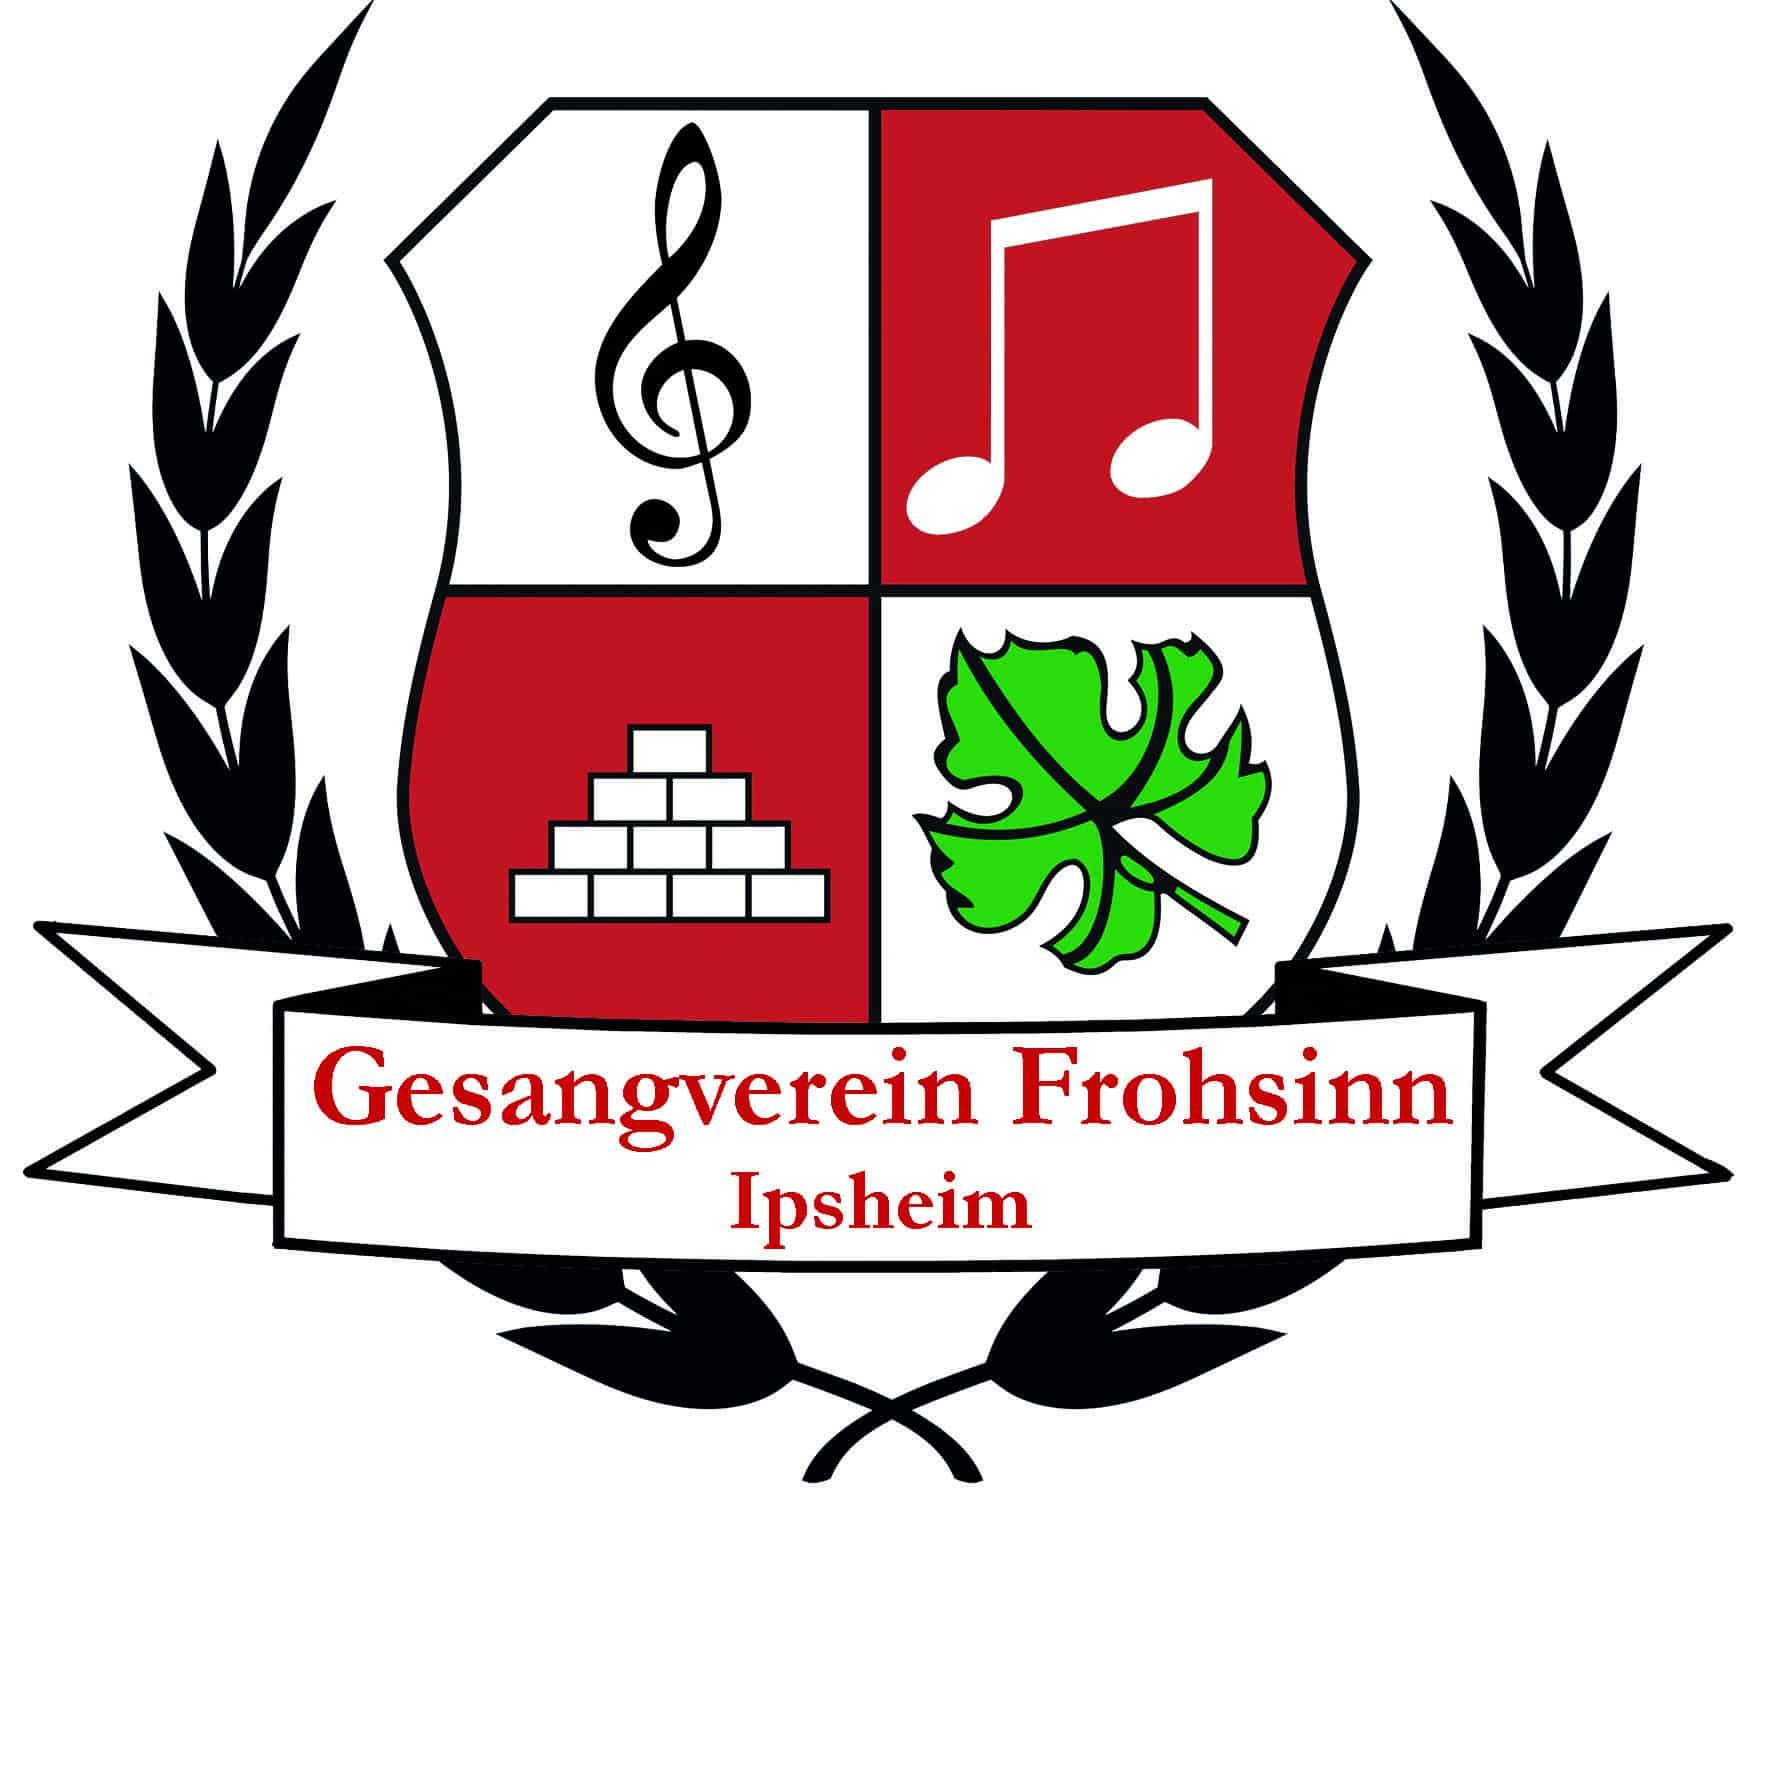 Gesangverein Frohsinn Ipsheim